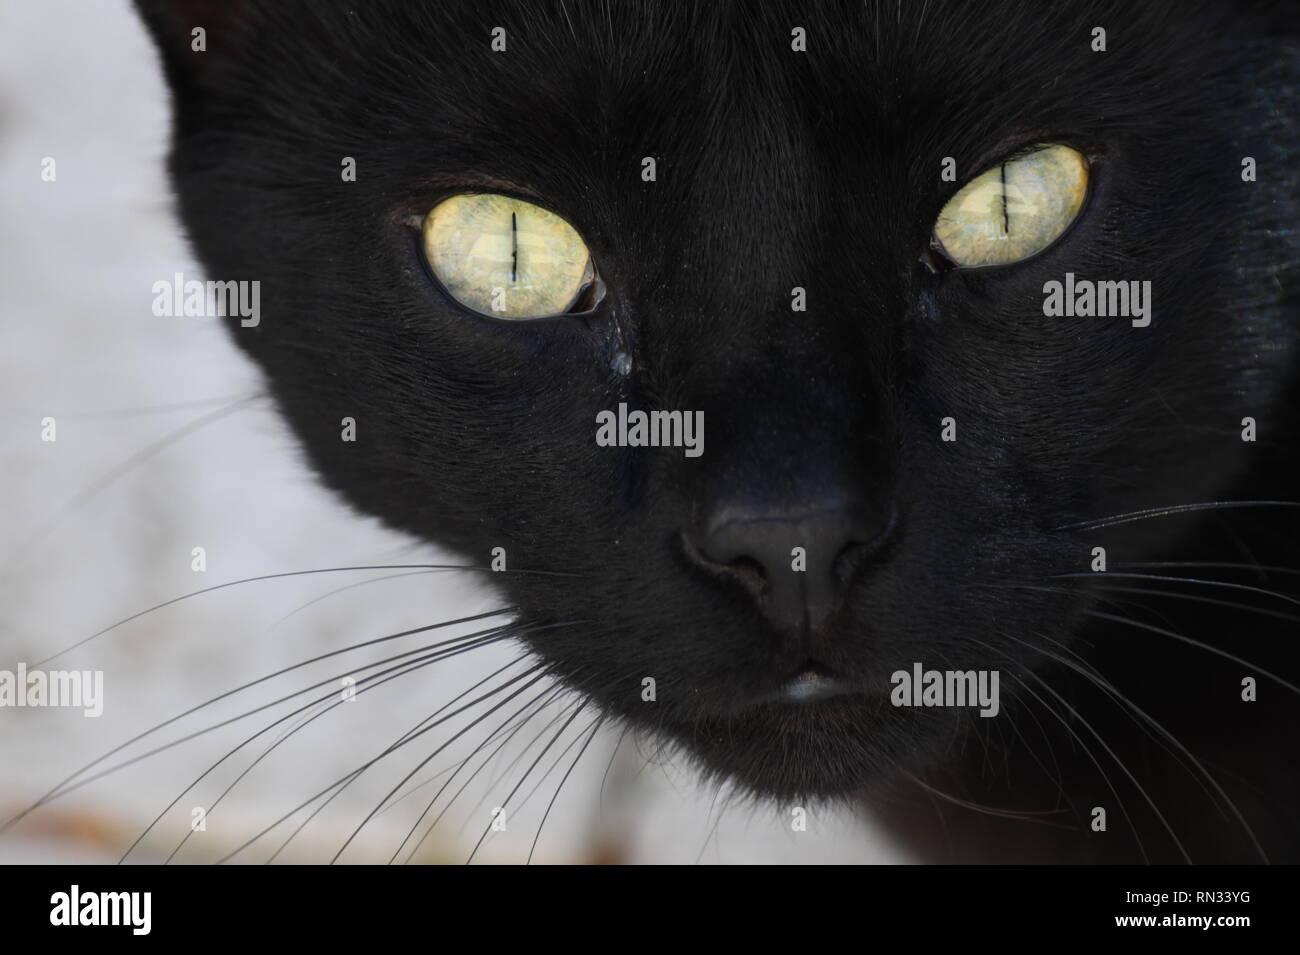 mysterious black cat seeking proximity - Stock Image